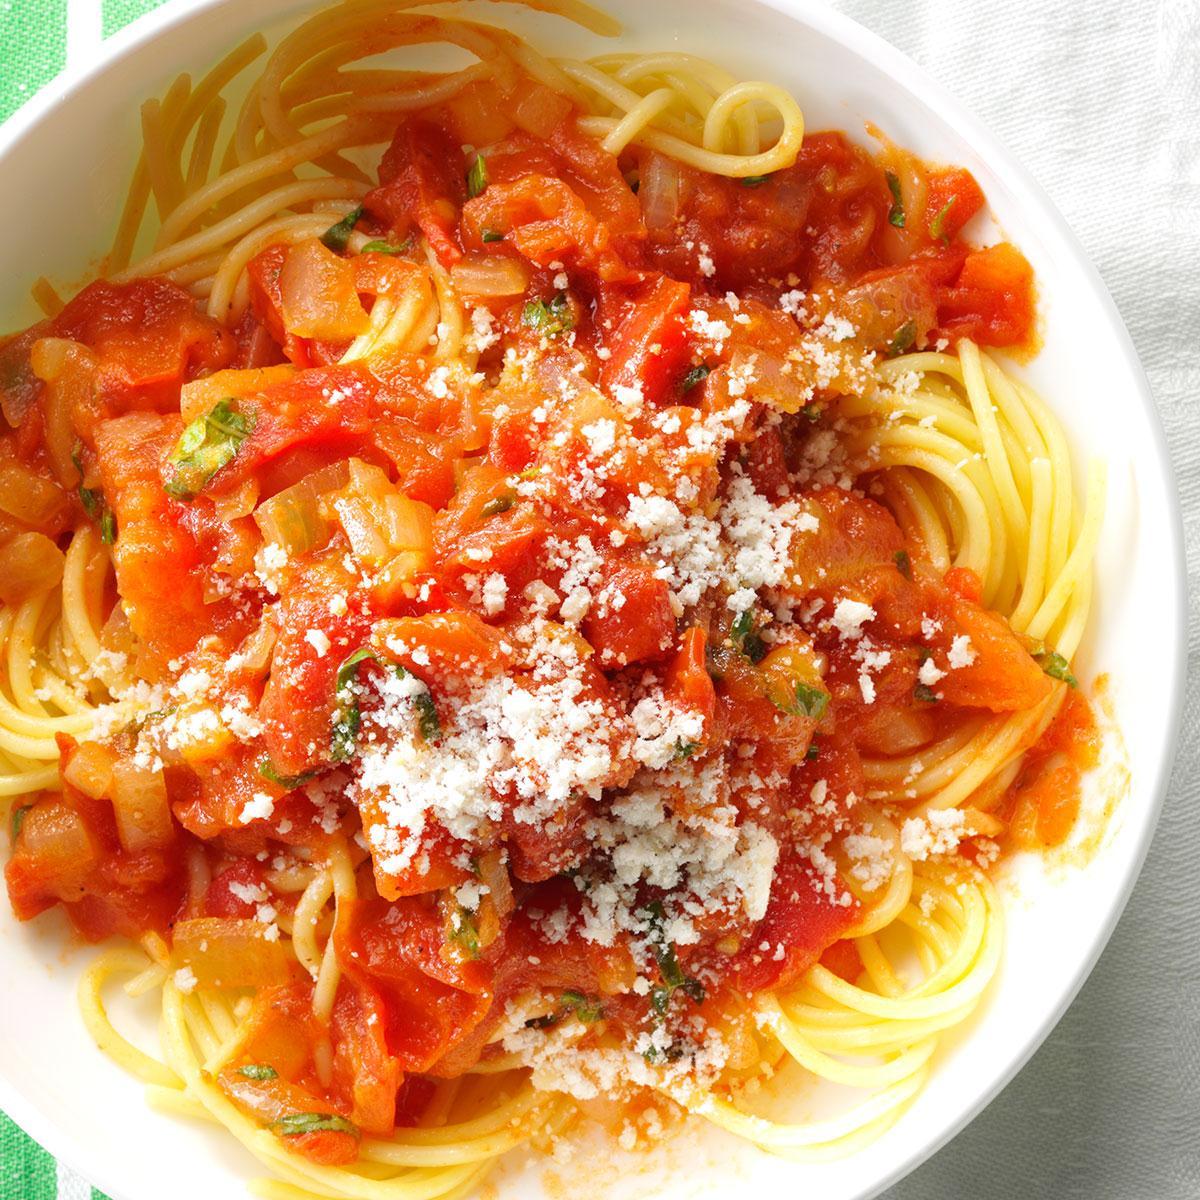 Glancing Spaghetti Home How To Thicken Tomato Sauce From Scratch How To Thicken Tomato Sauce Without Tomato Paste Fresh Tomato Sauce Recipe Taste houzz-02 How To Thicken Tomato Sauce